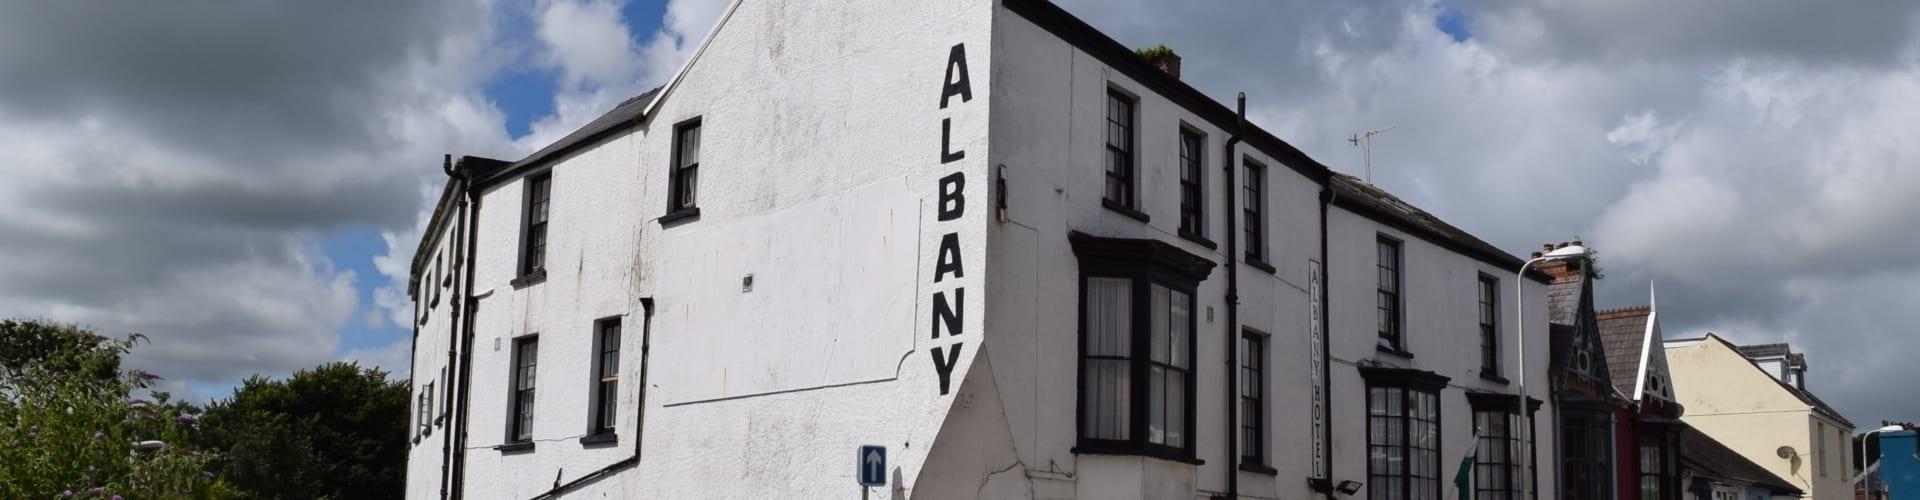 Albany Hotel - Listing